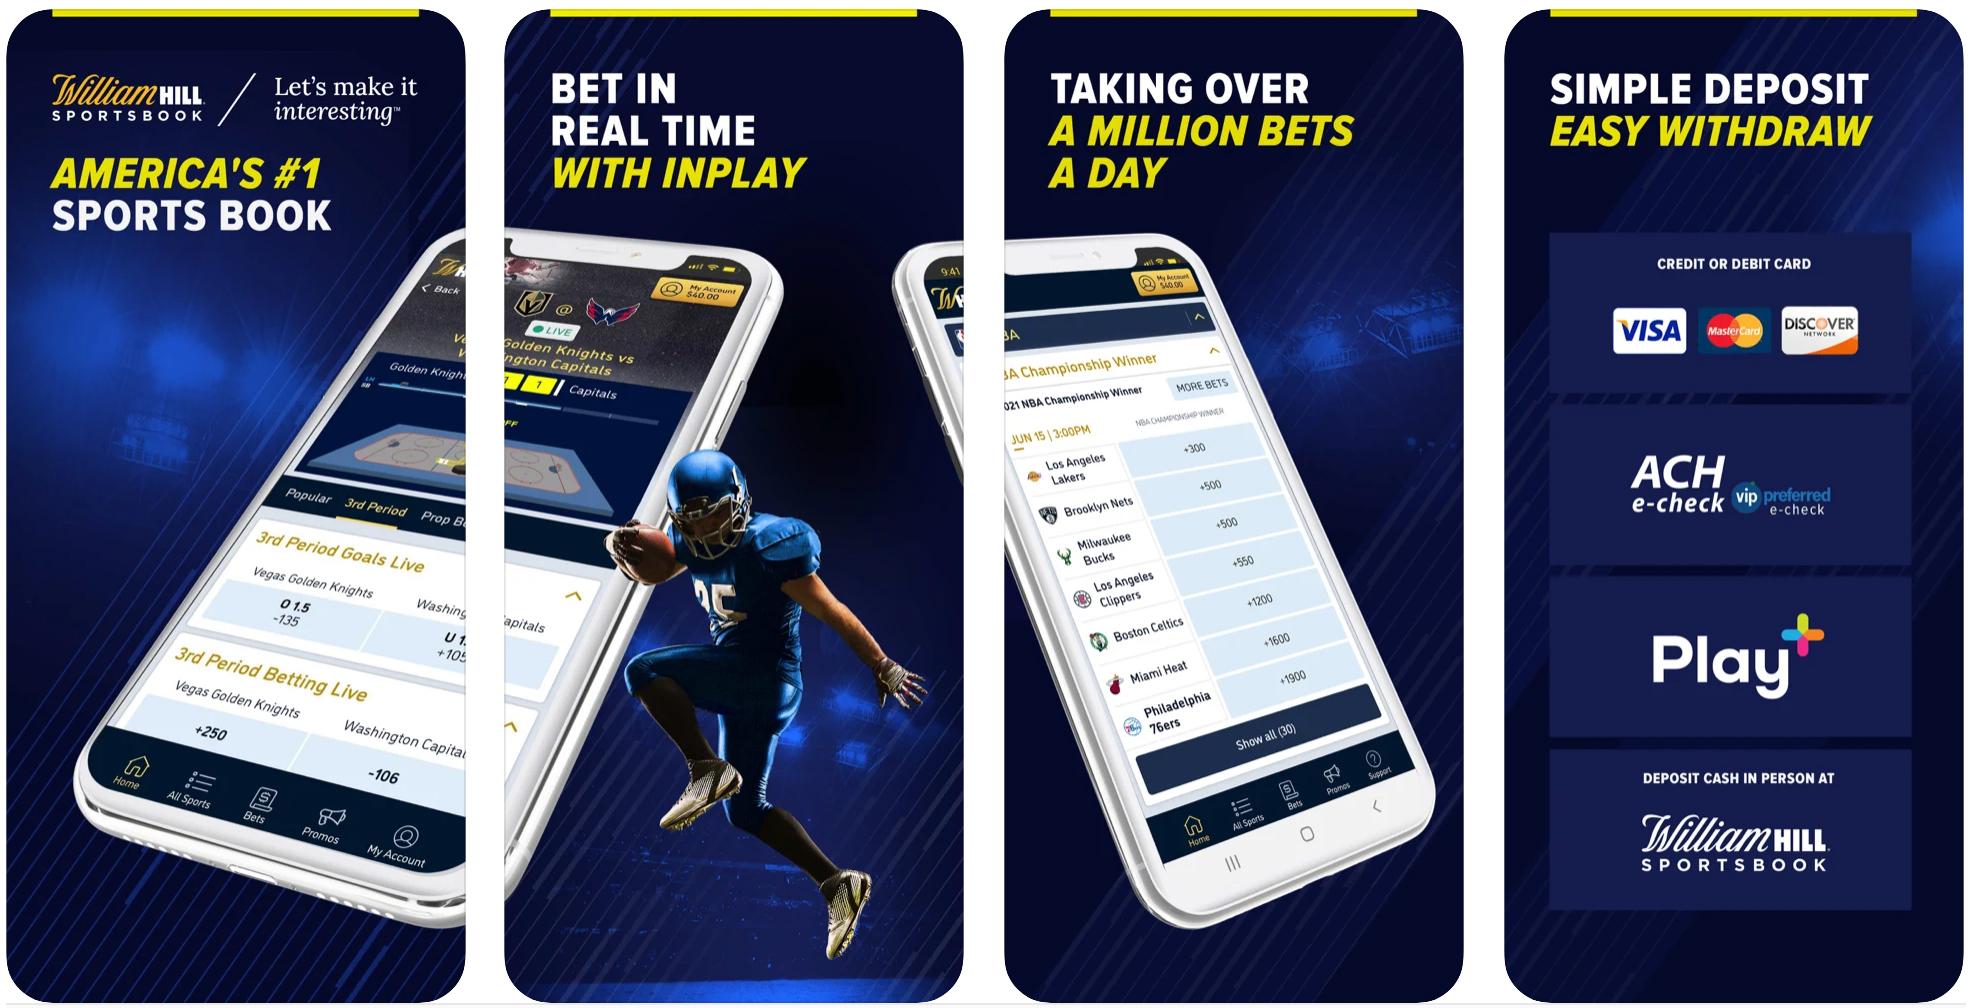 William Hill Sportsbook Mobile App